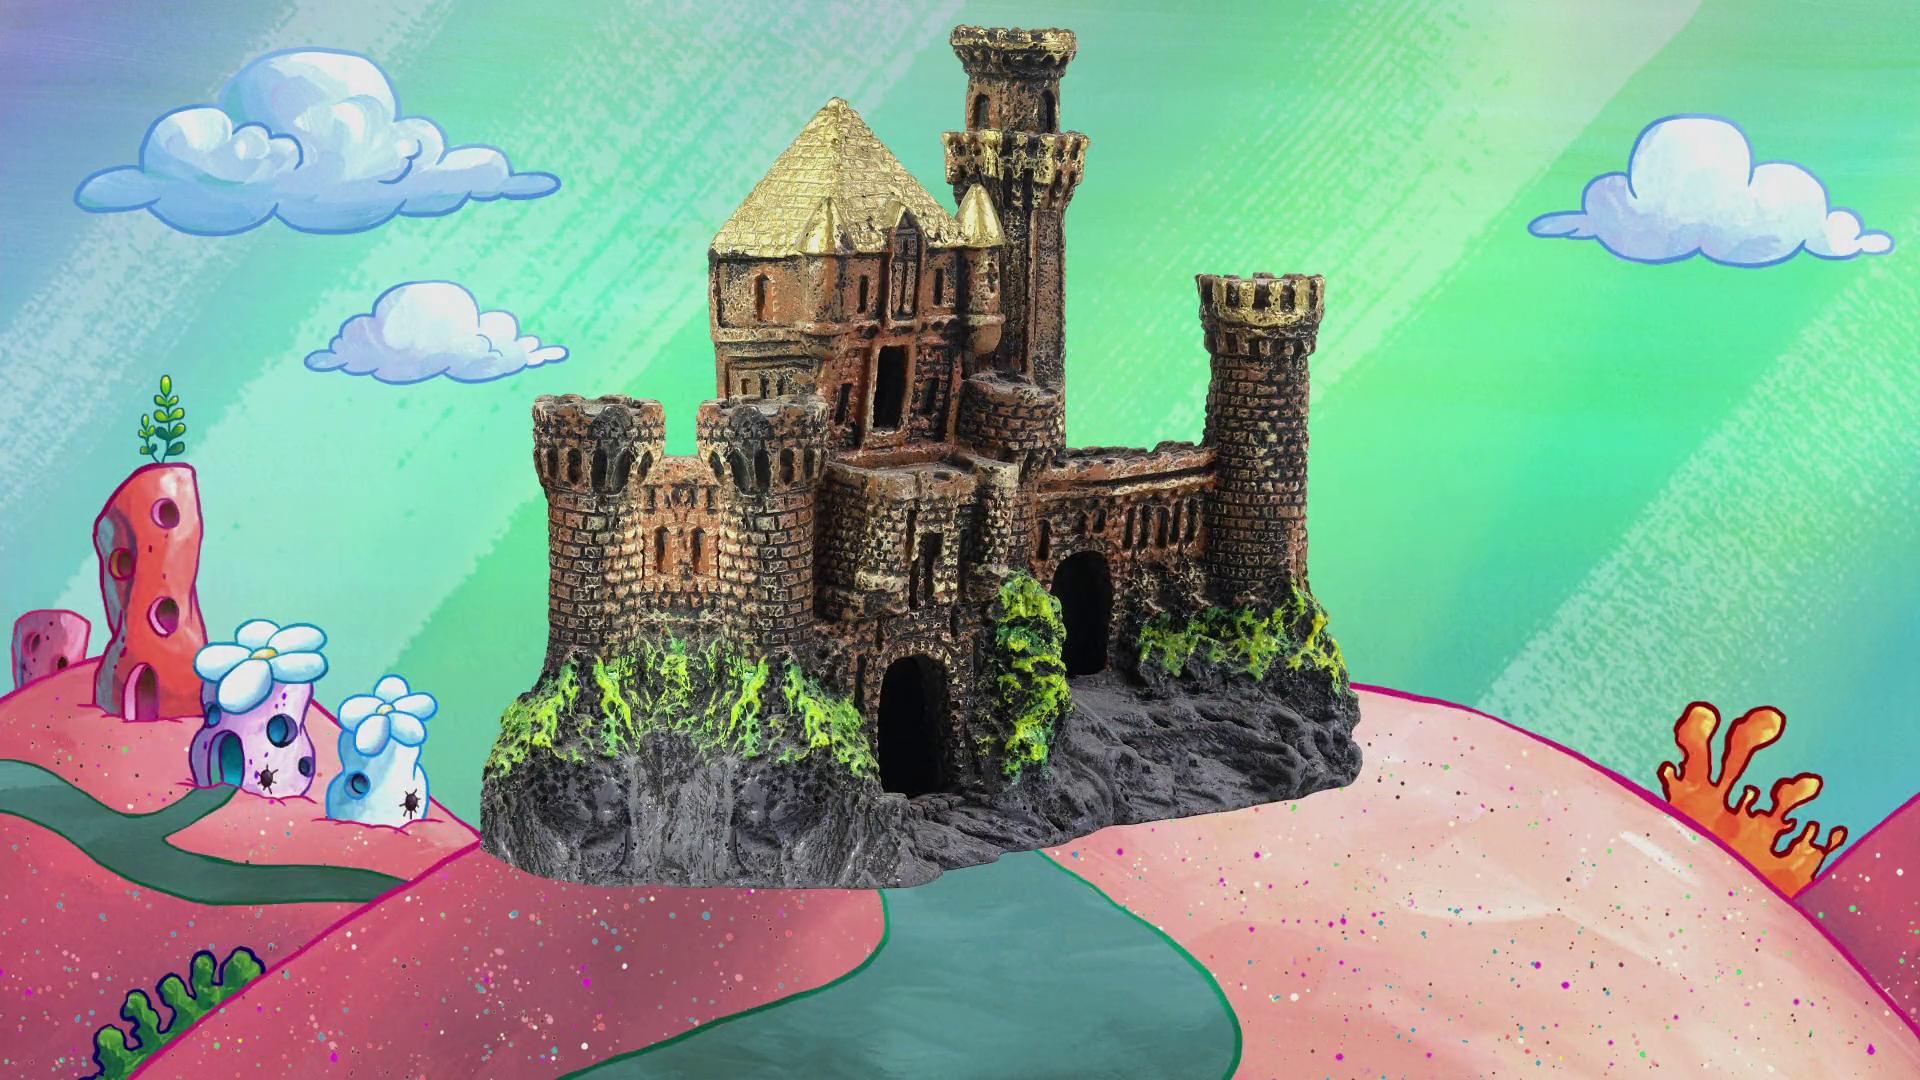 King Plankton's castle